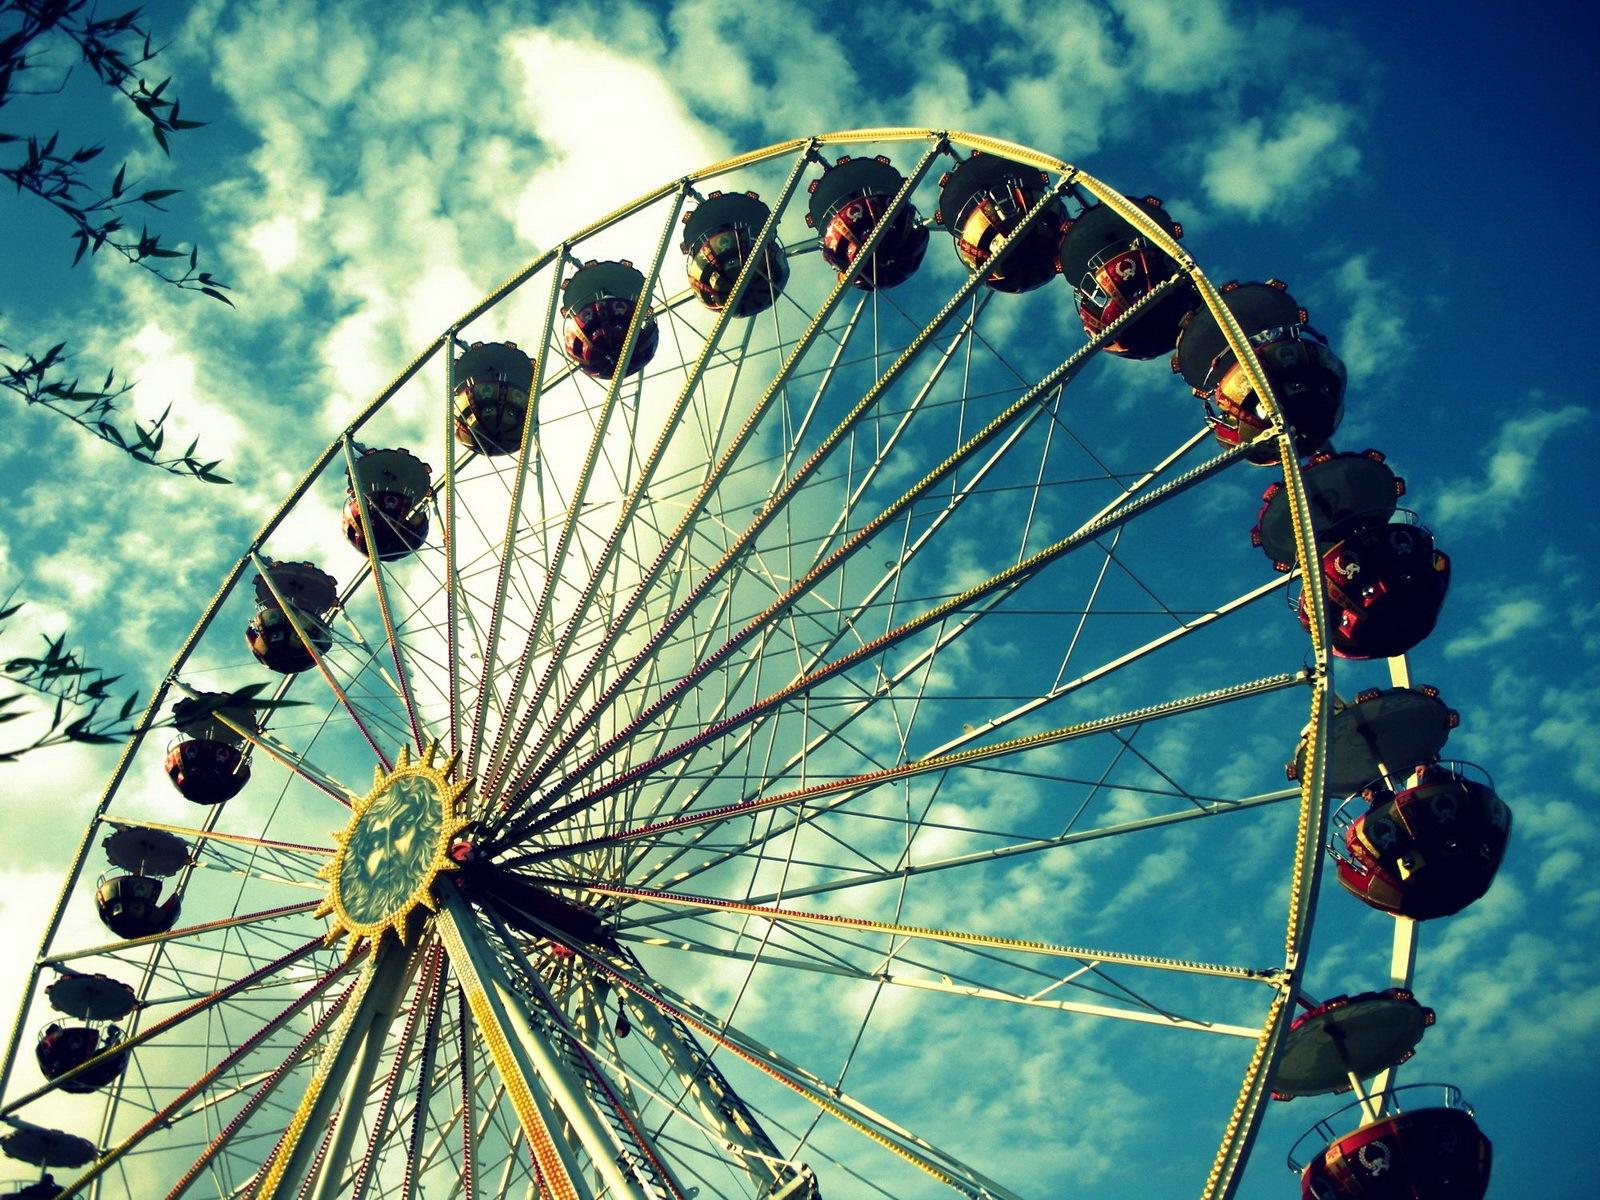 Hd 1600x1200 Big Ferris Wheel Desktop Wallpapers Backgrounds 1600x1200